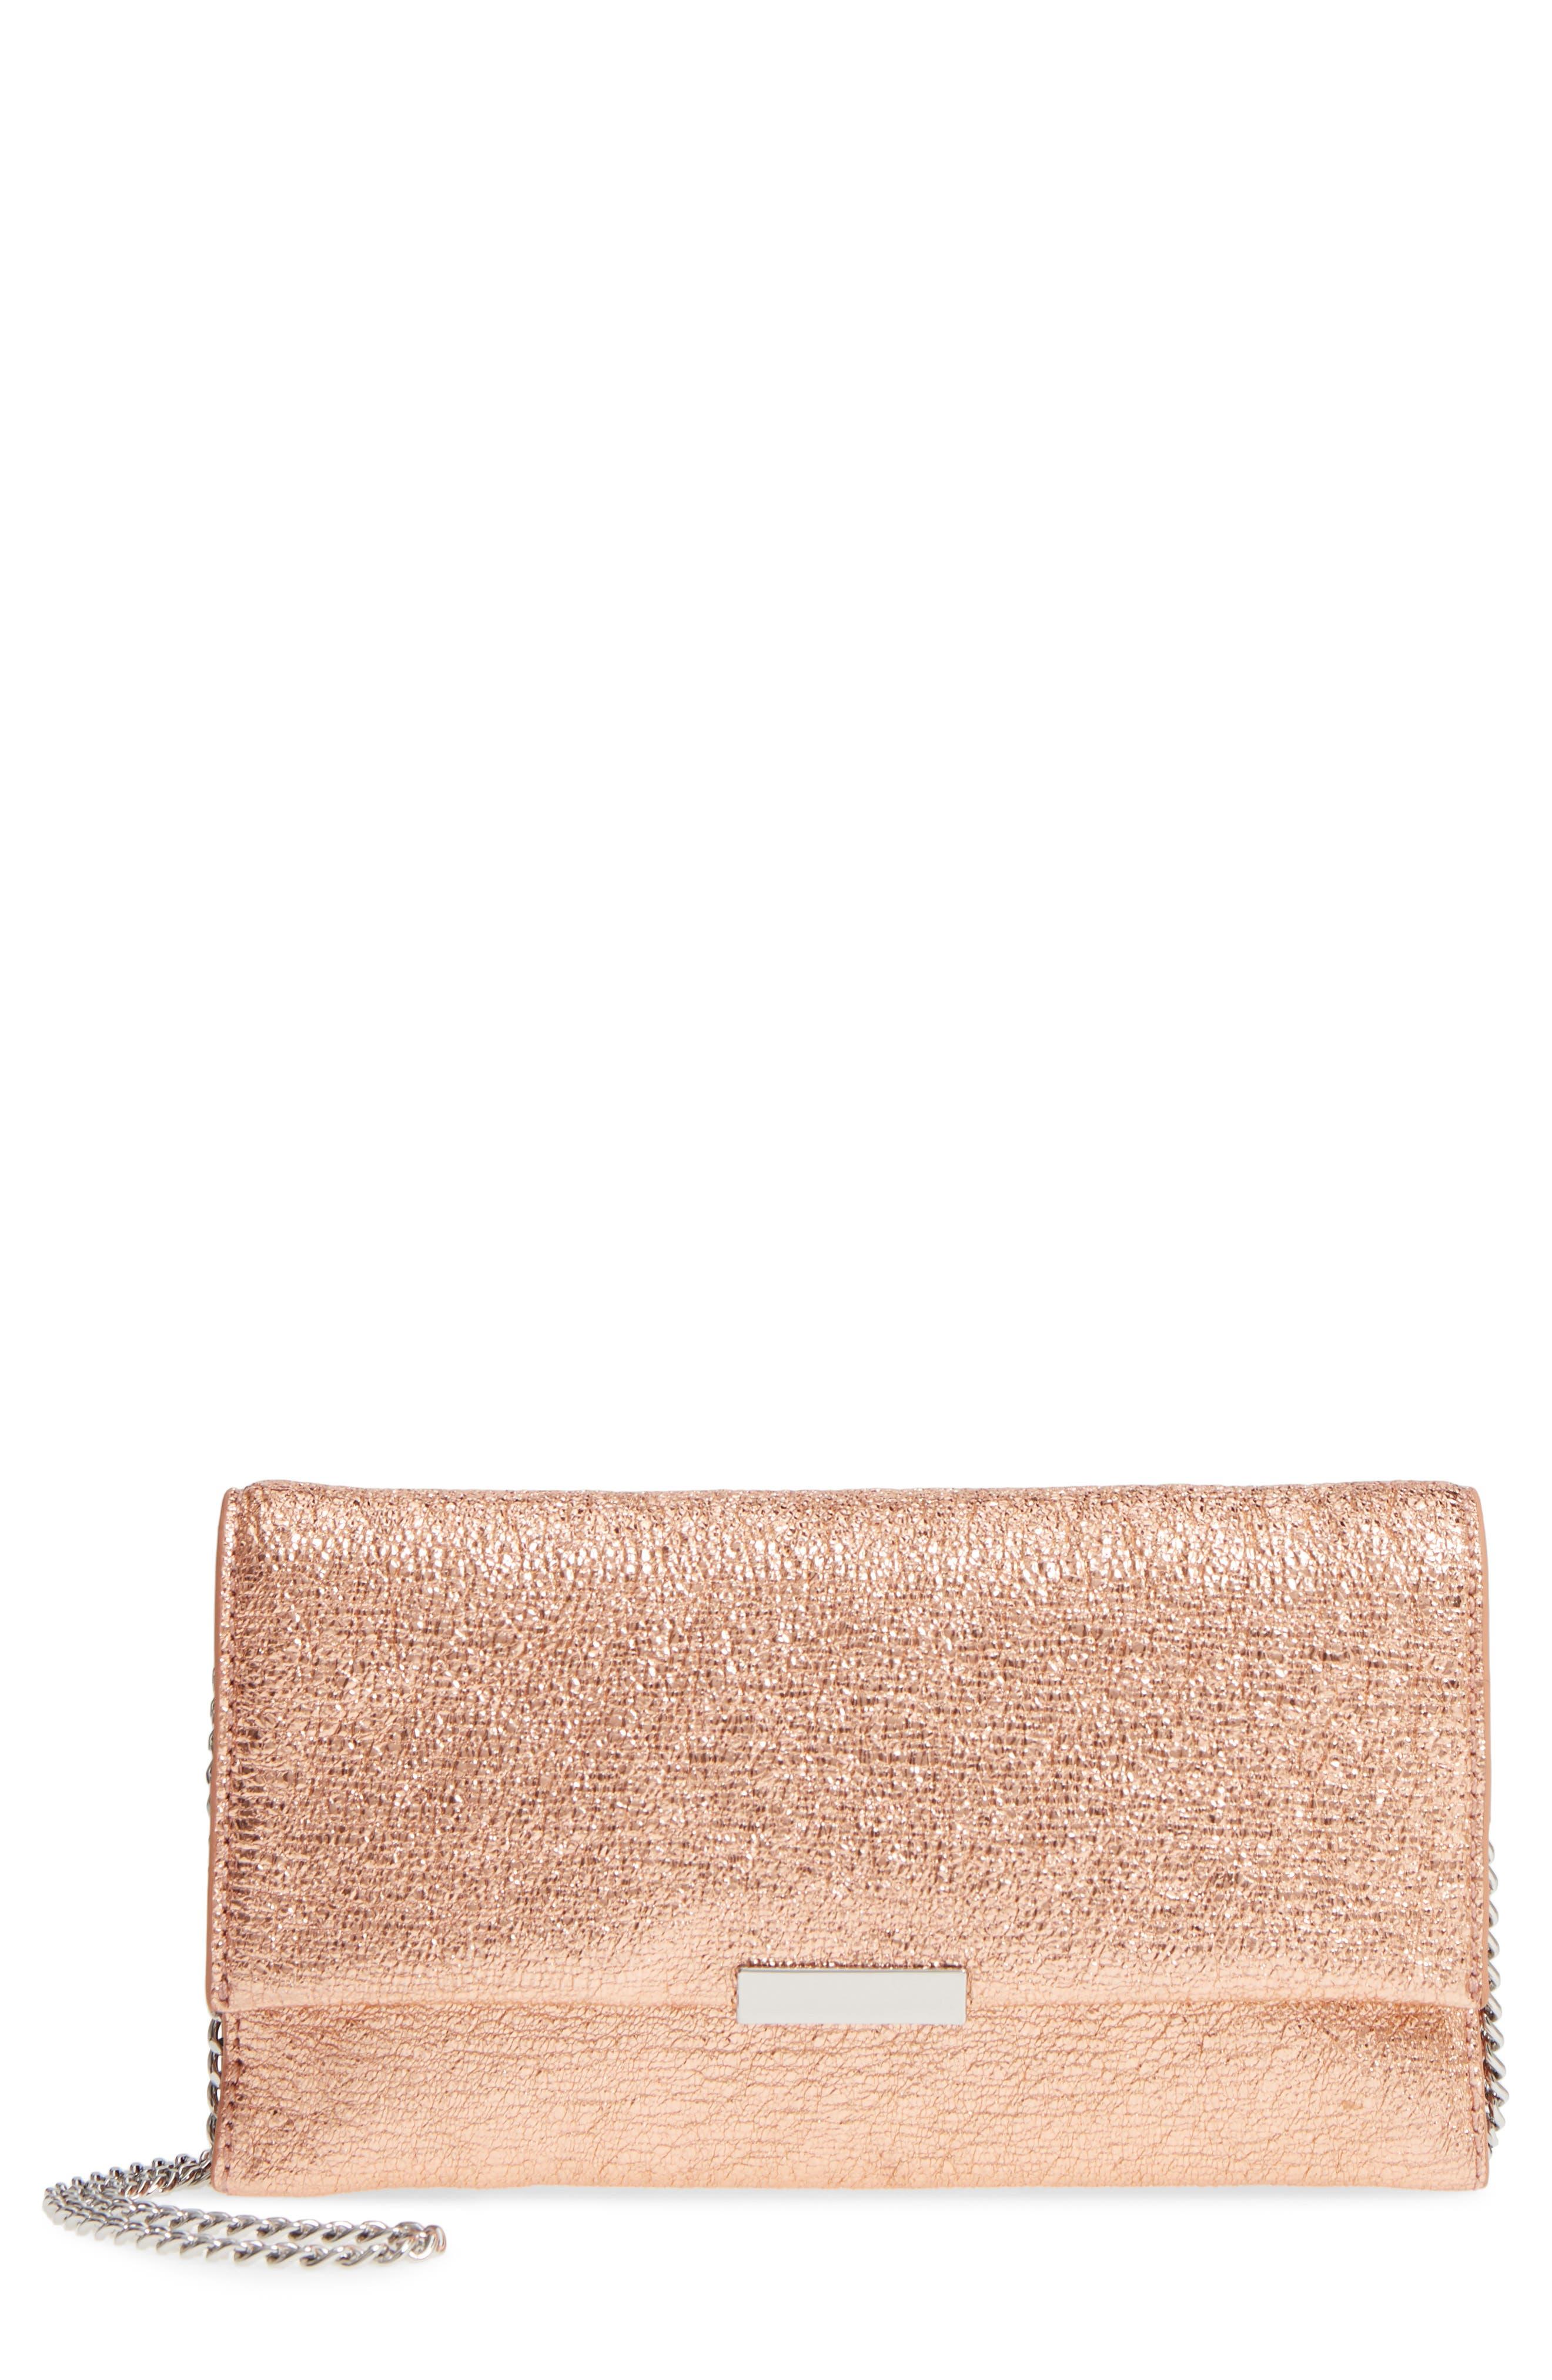 Alternate Image 1 Selected - Loeffler Randall Metallic Leather Tab Clutch